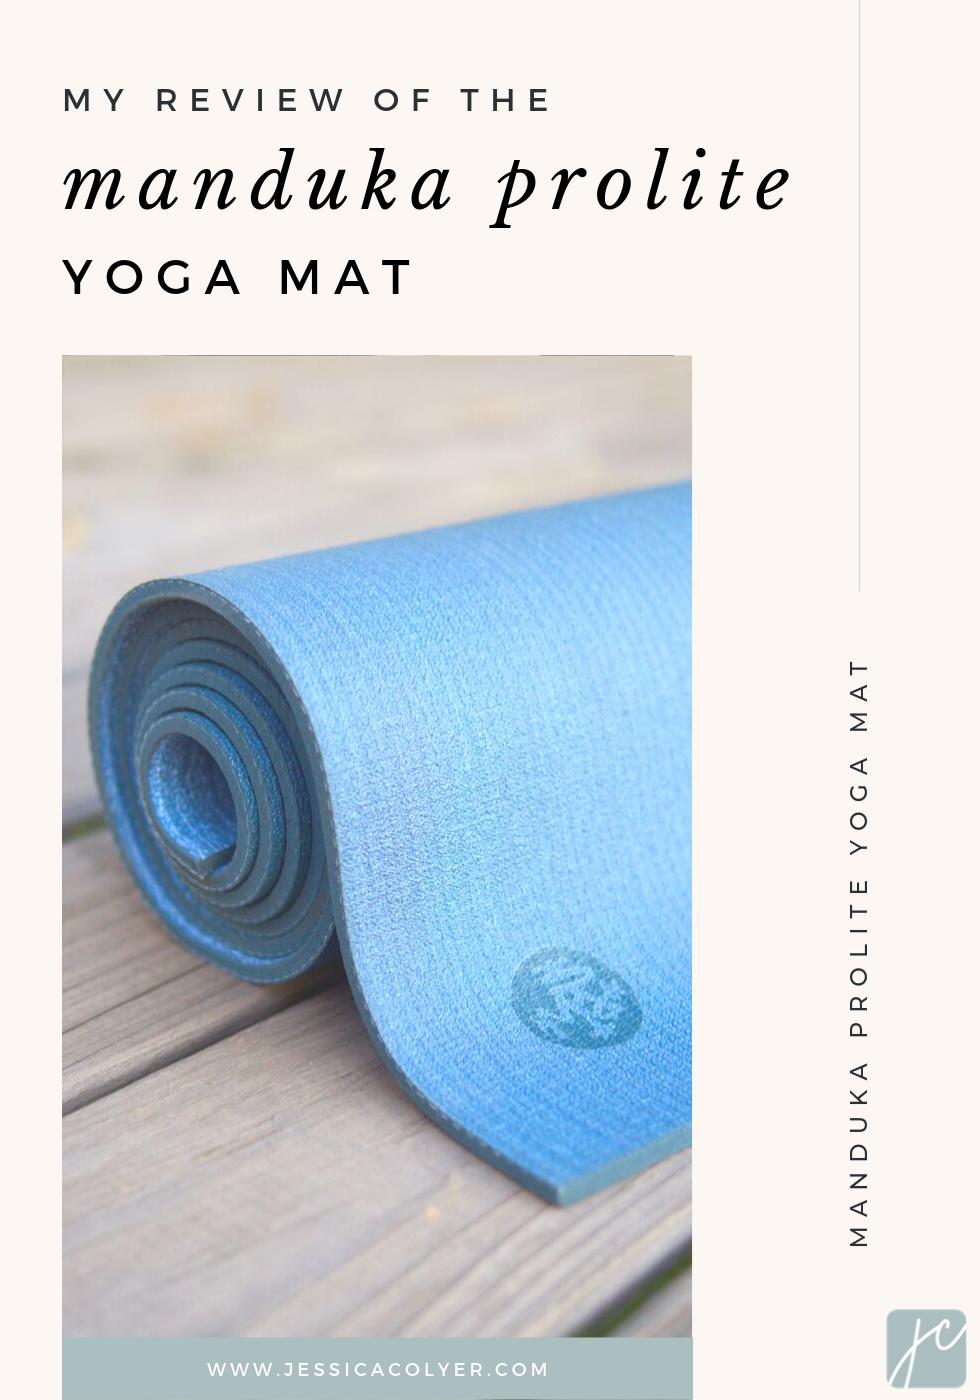 My Review of the Manduka ProLite Yoga Mat